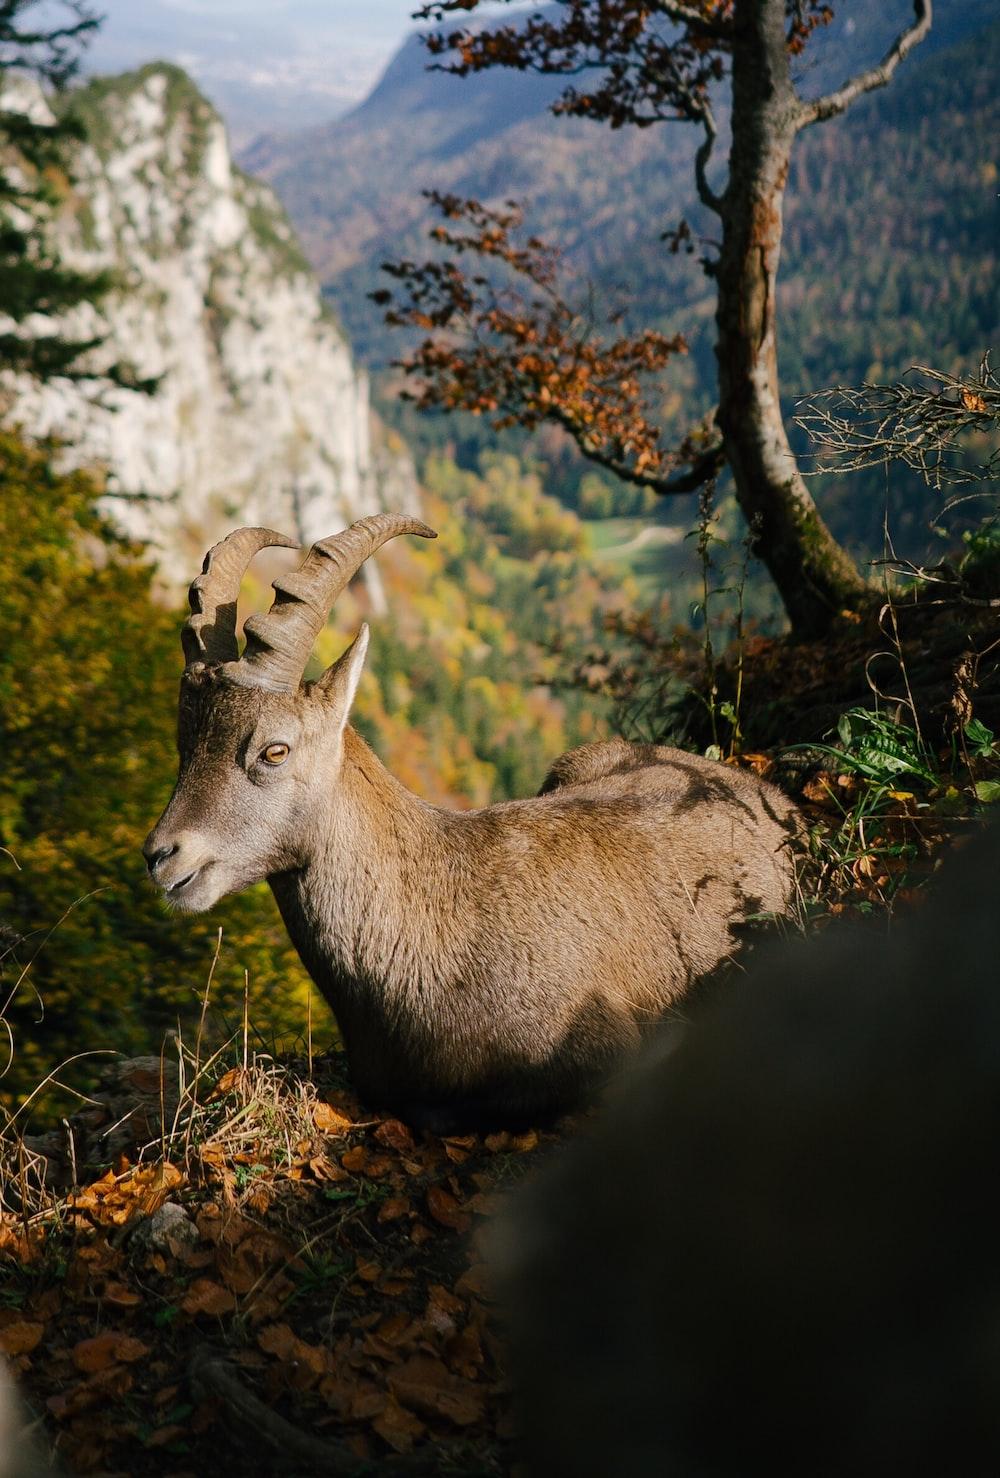 mountain goat lying on ground near tree on top of mountain